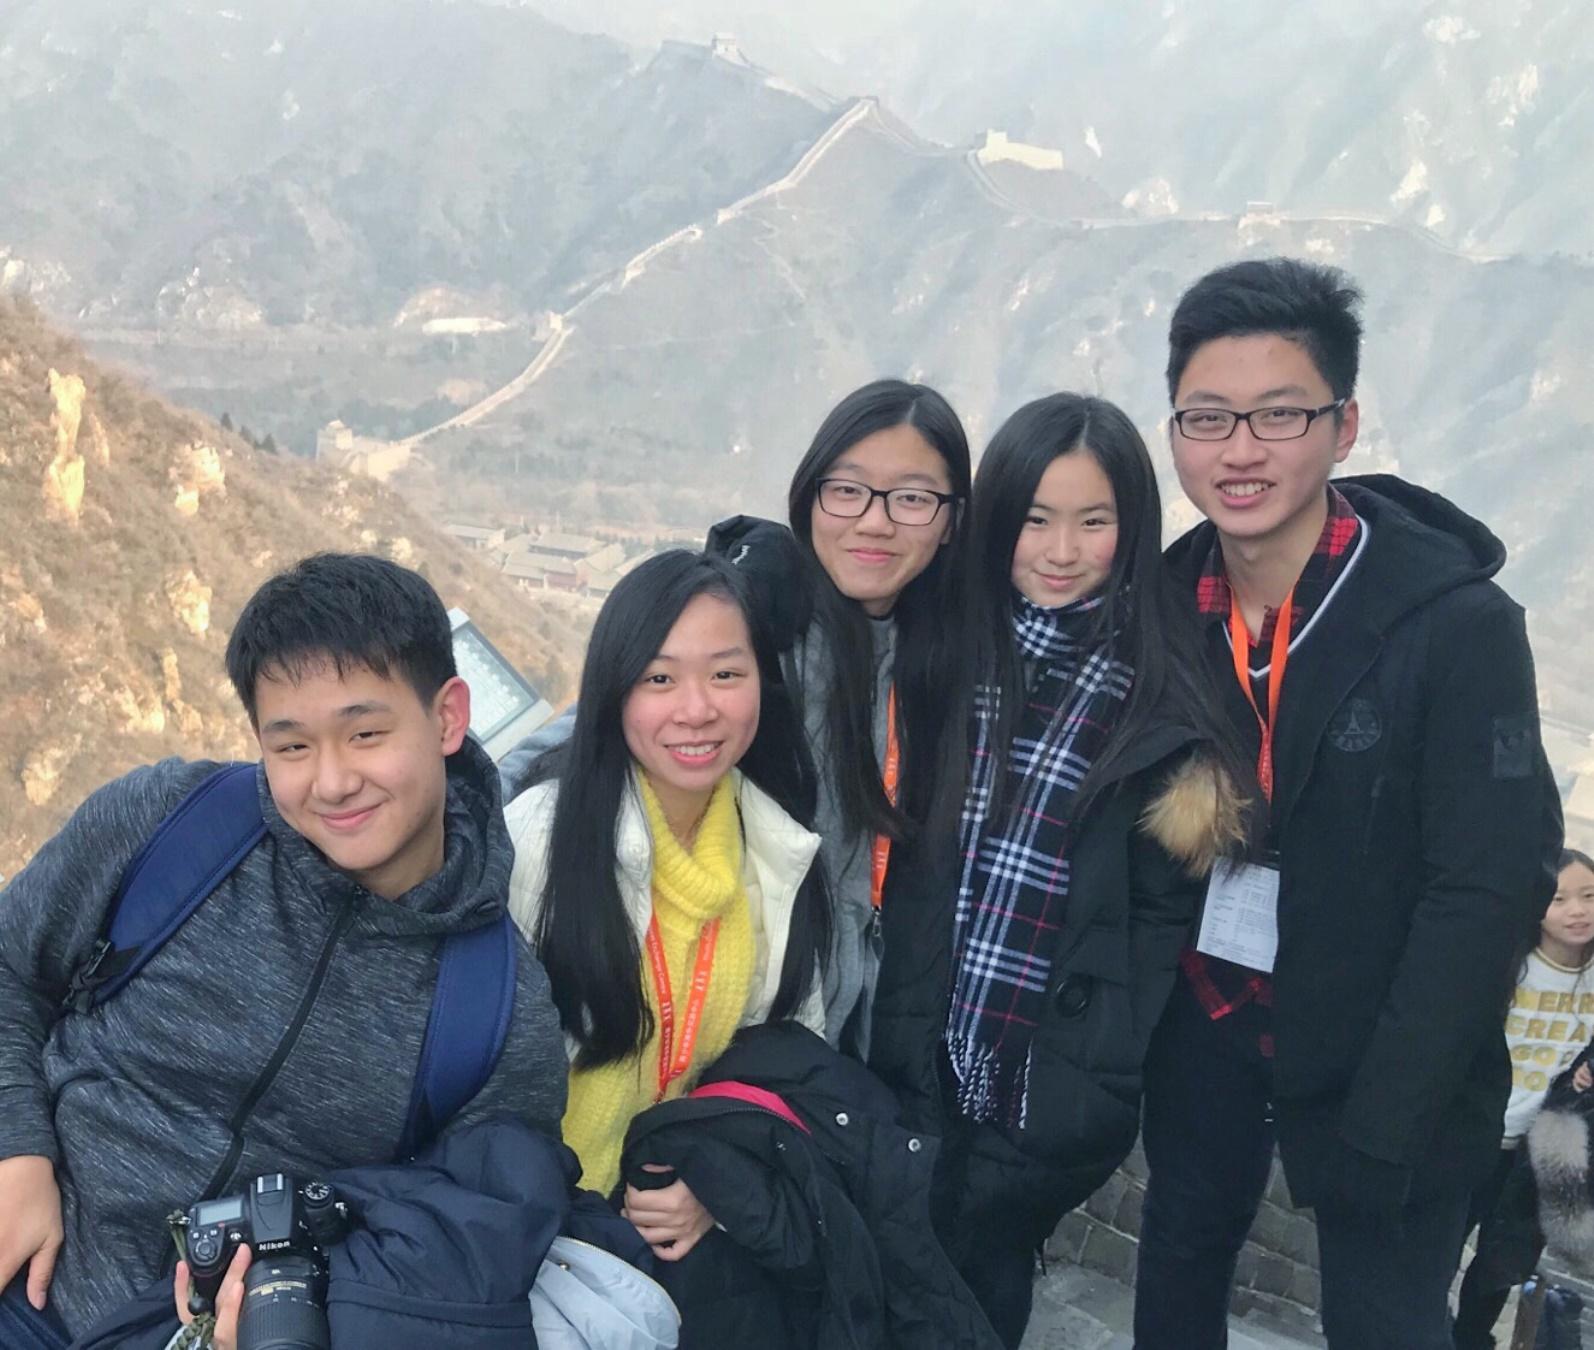 http://npc.edu.hk/sites/default/files/img_2349_2.jpg